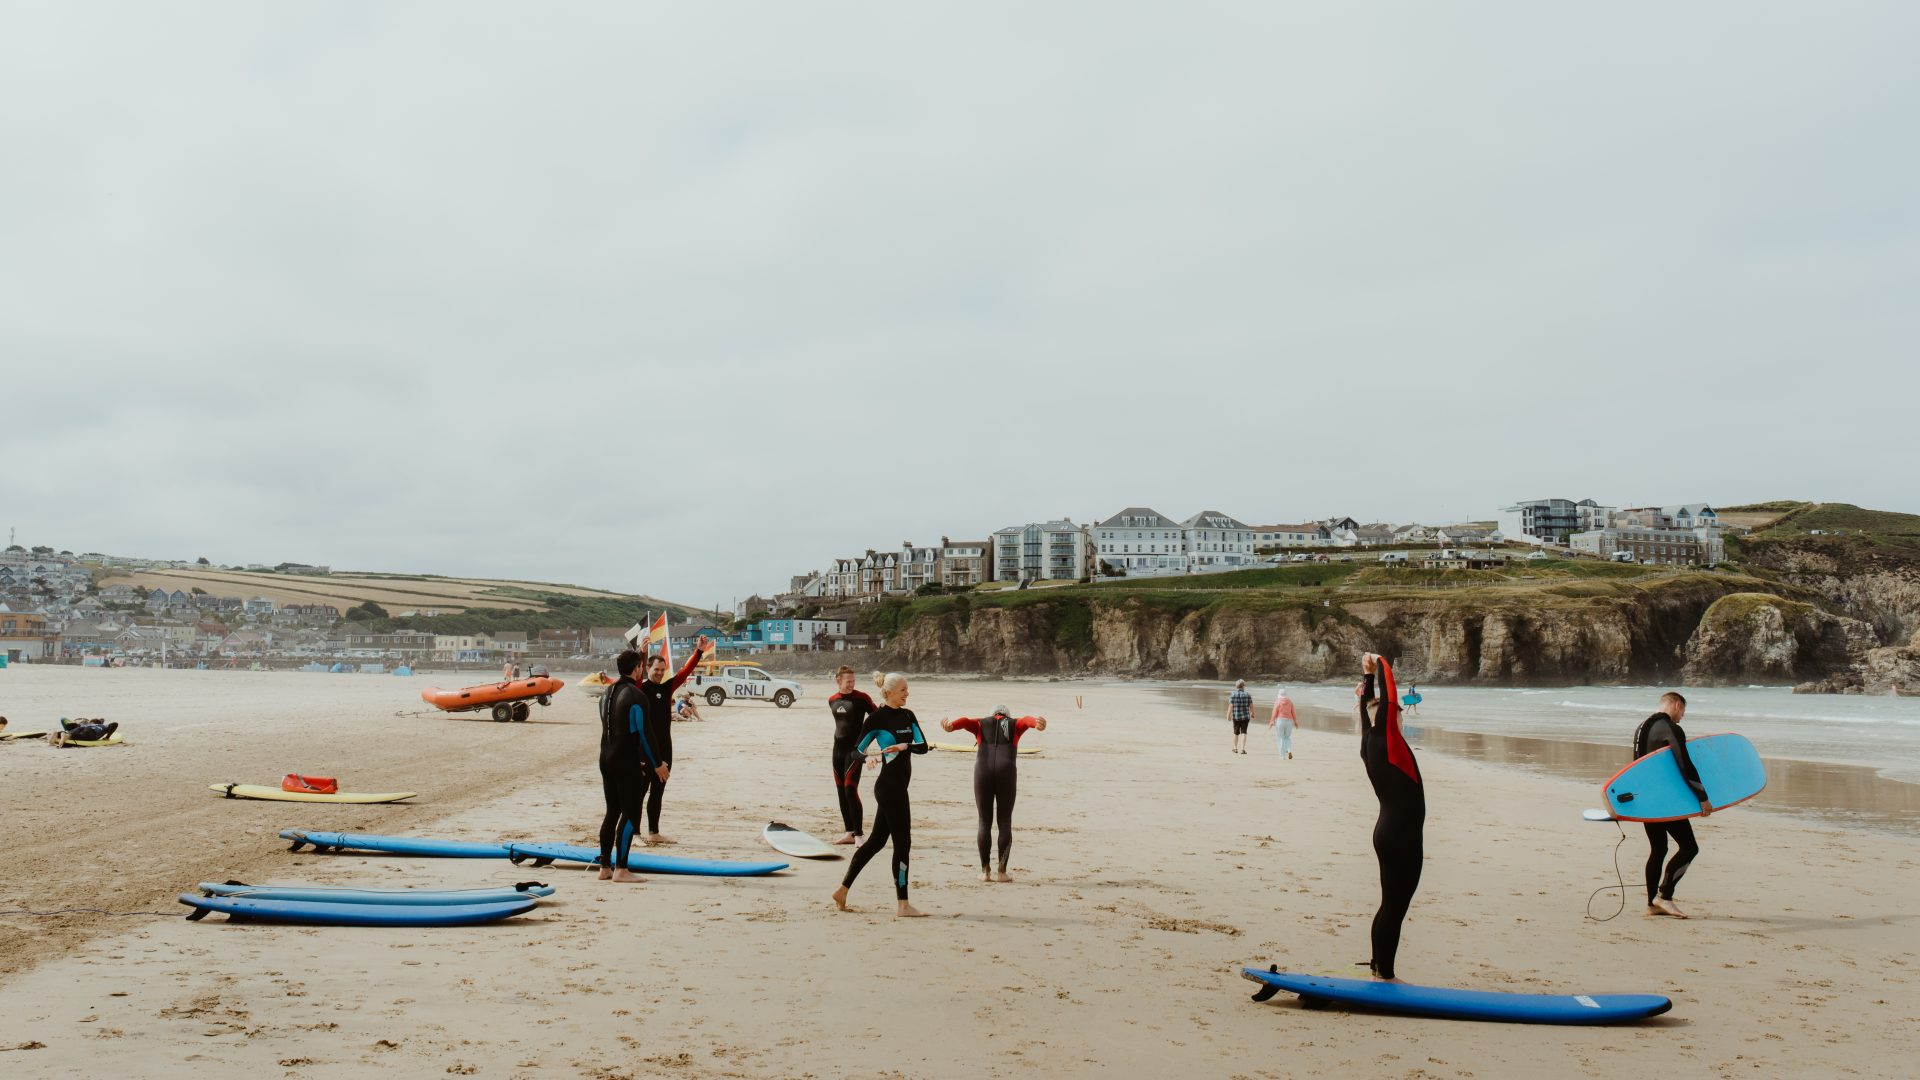 Surfing Portscatho beach